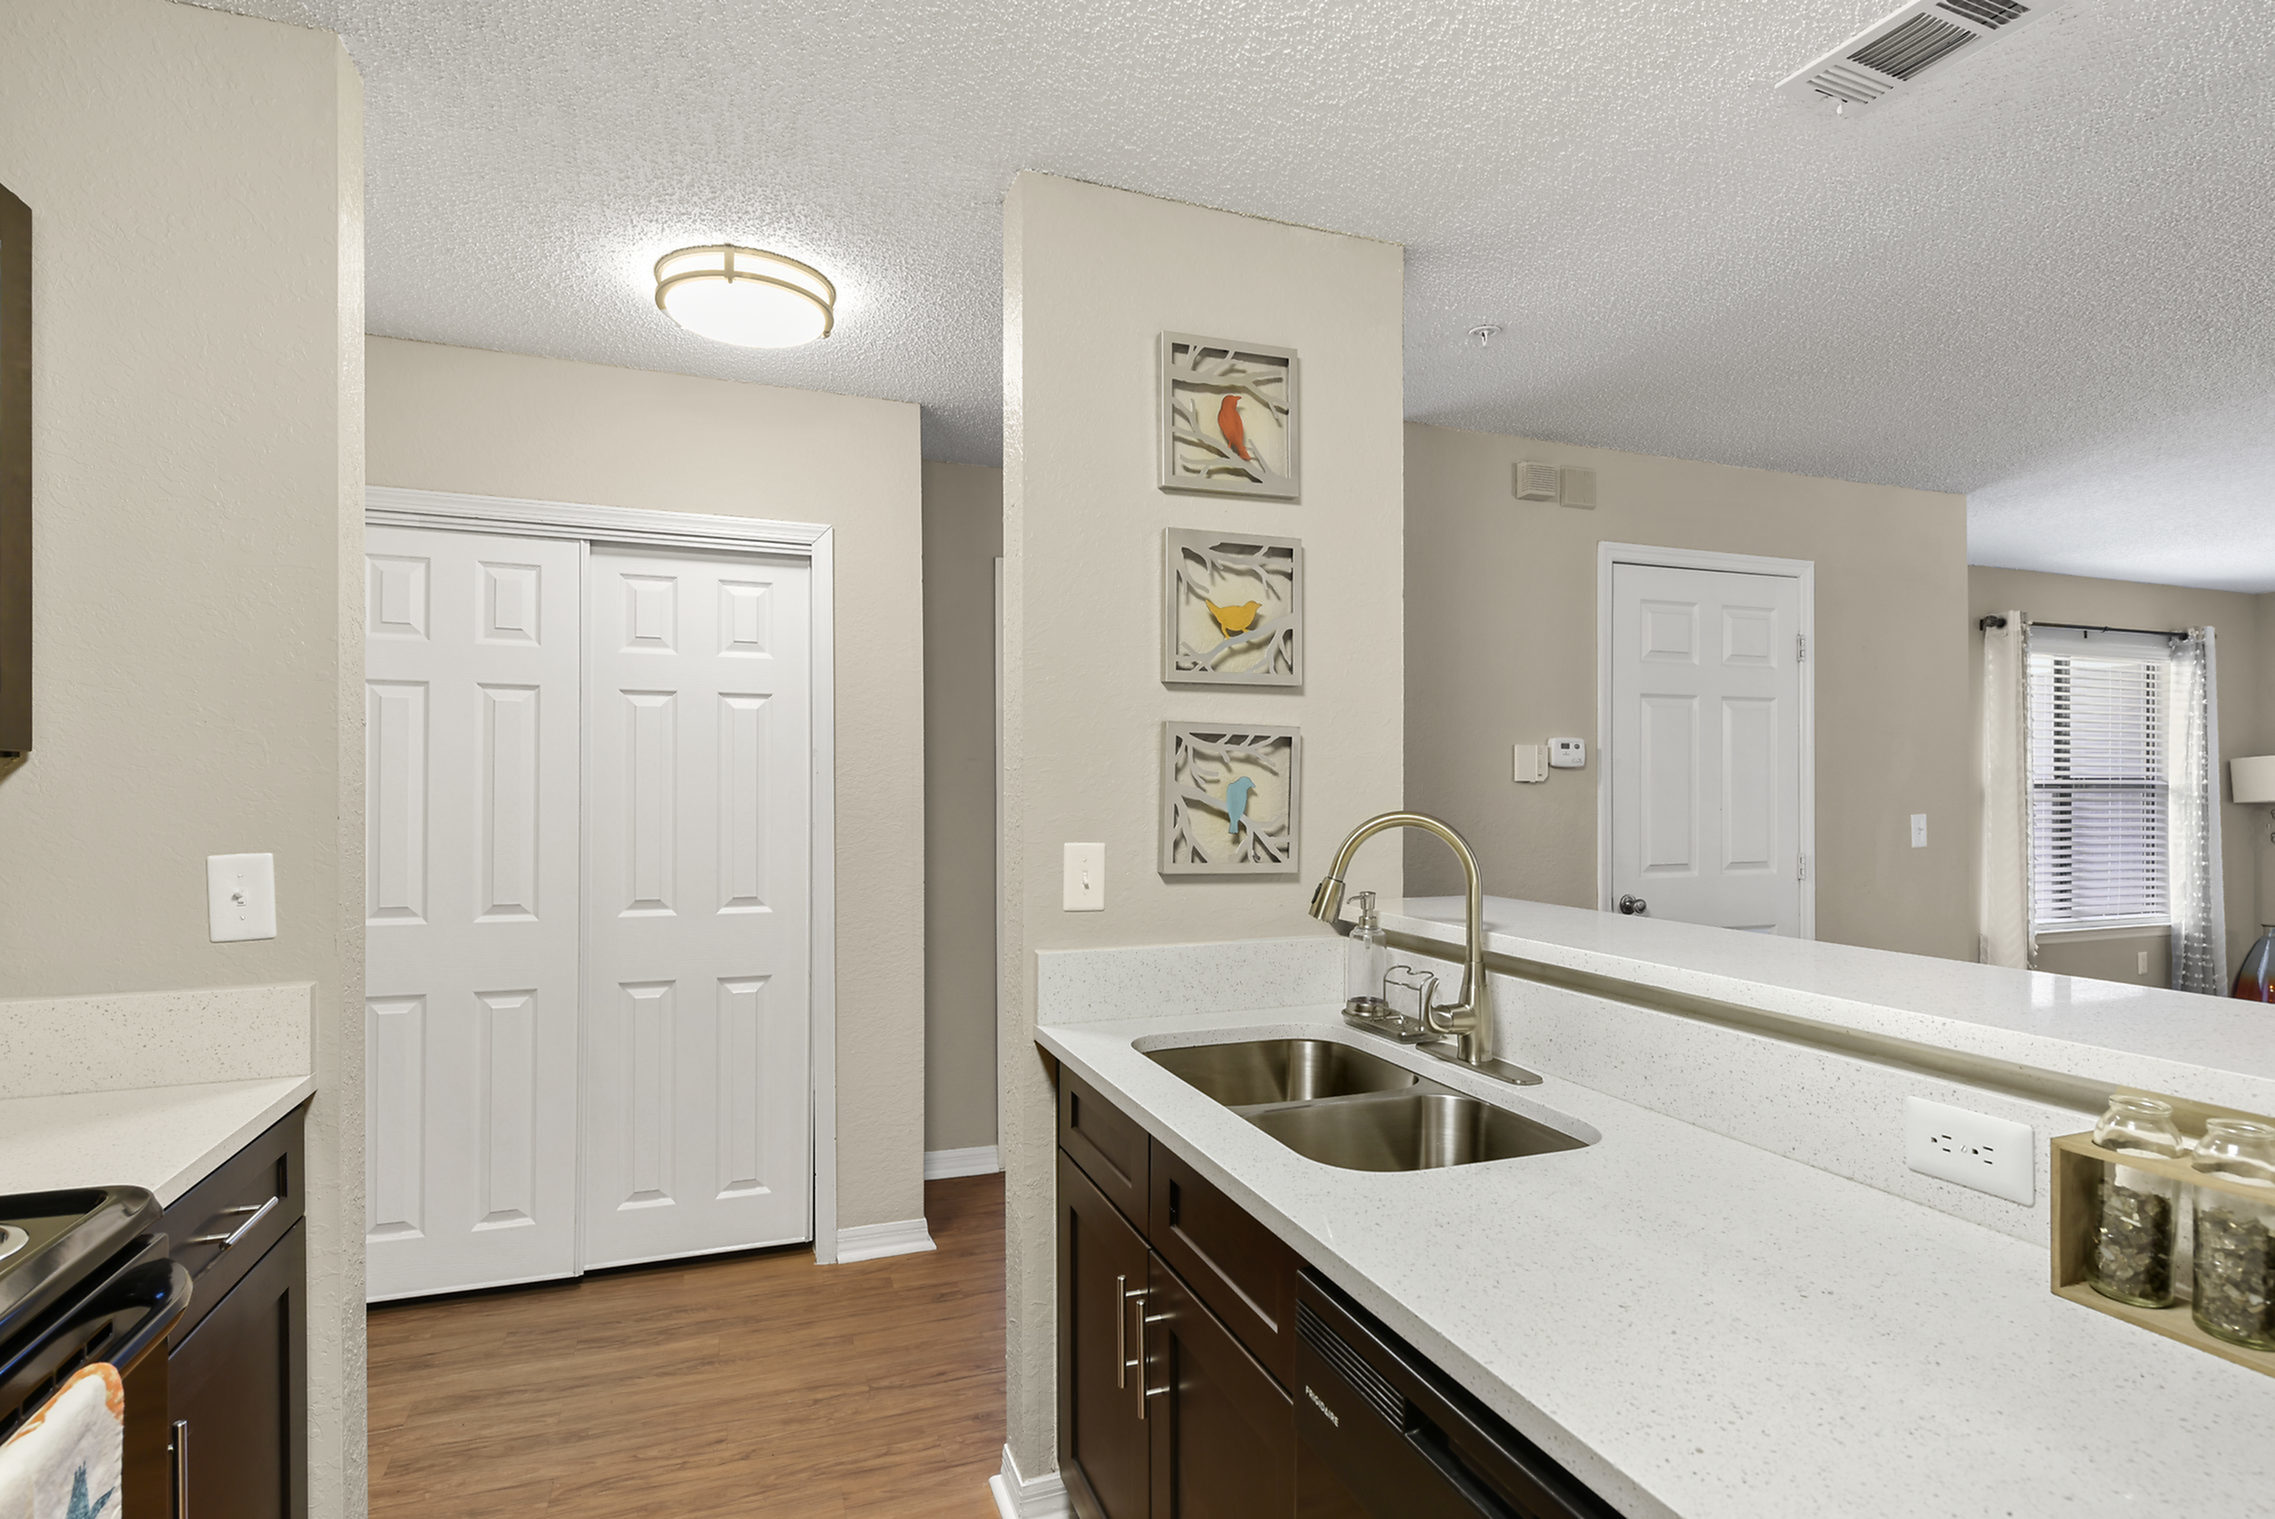 Image of Quartz Kitchen Countertops for Kernan Oaks